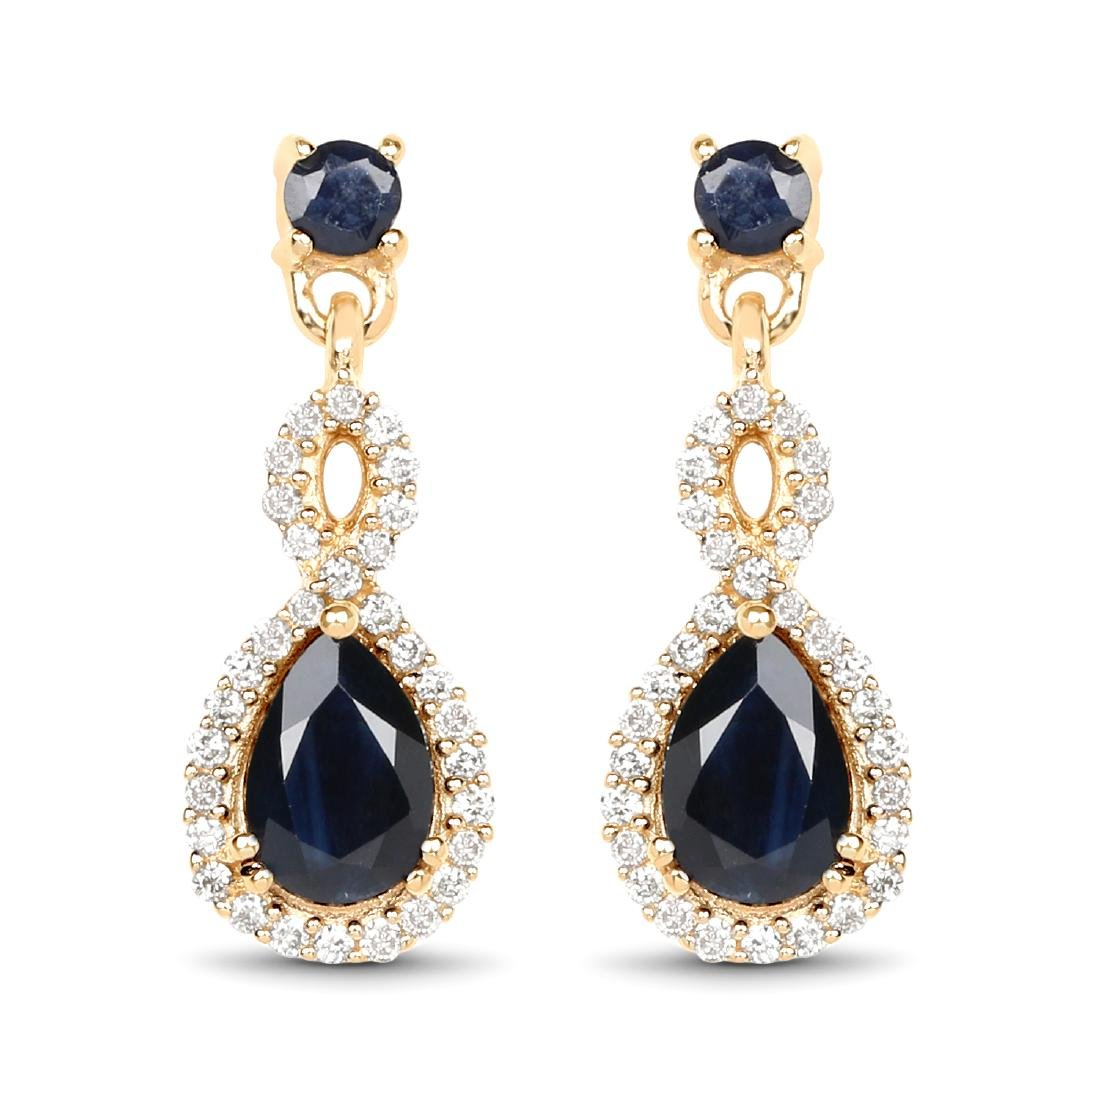 1.18 CTW Blue Sapphire & Diamond Earrings 14K Yellow